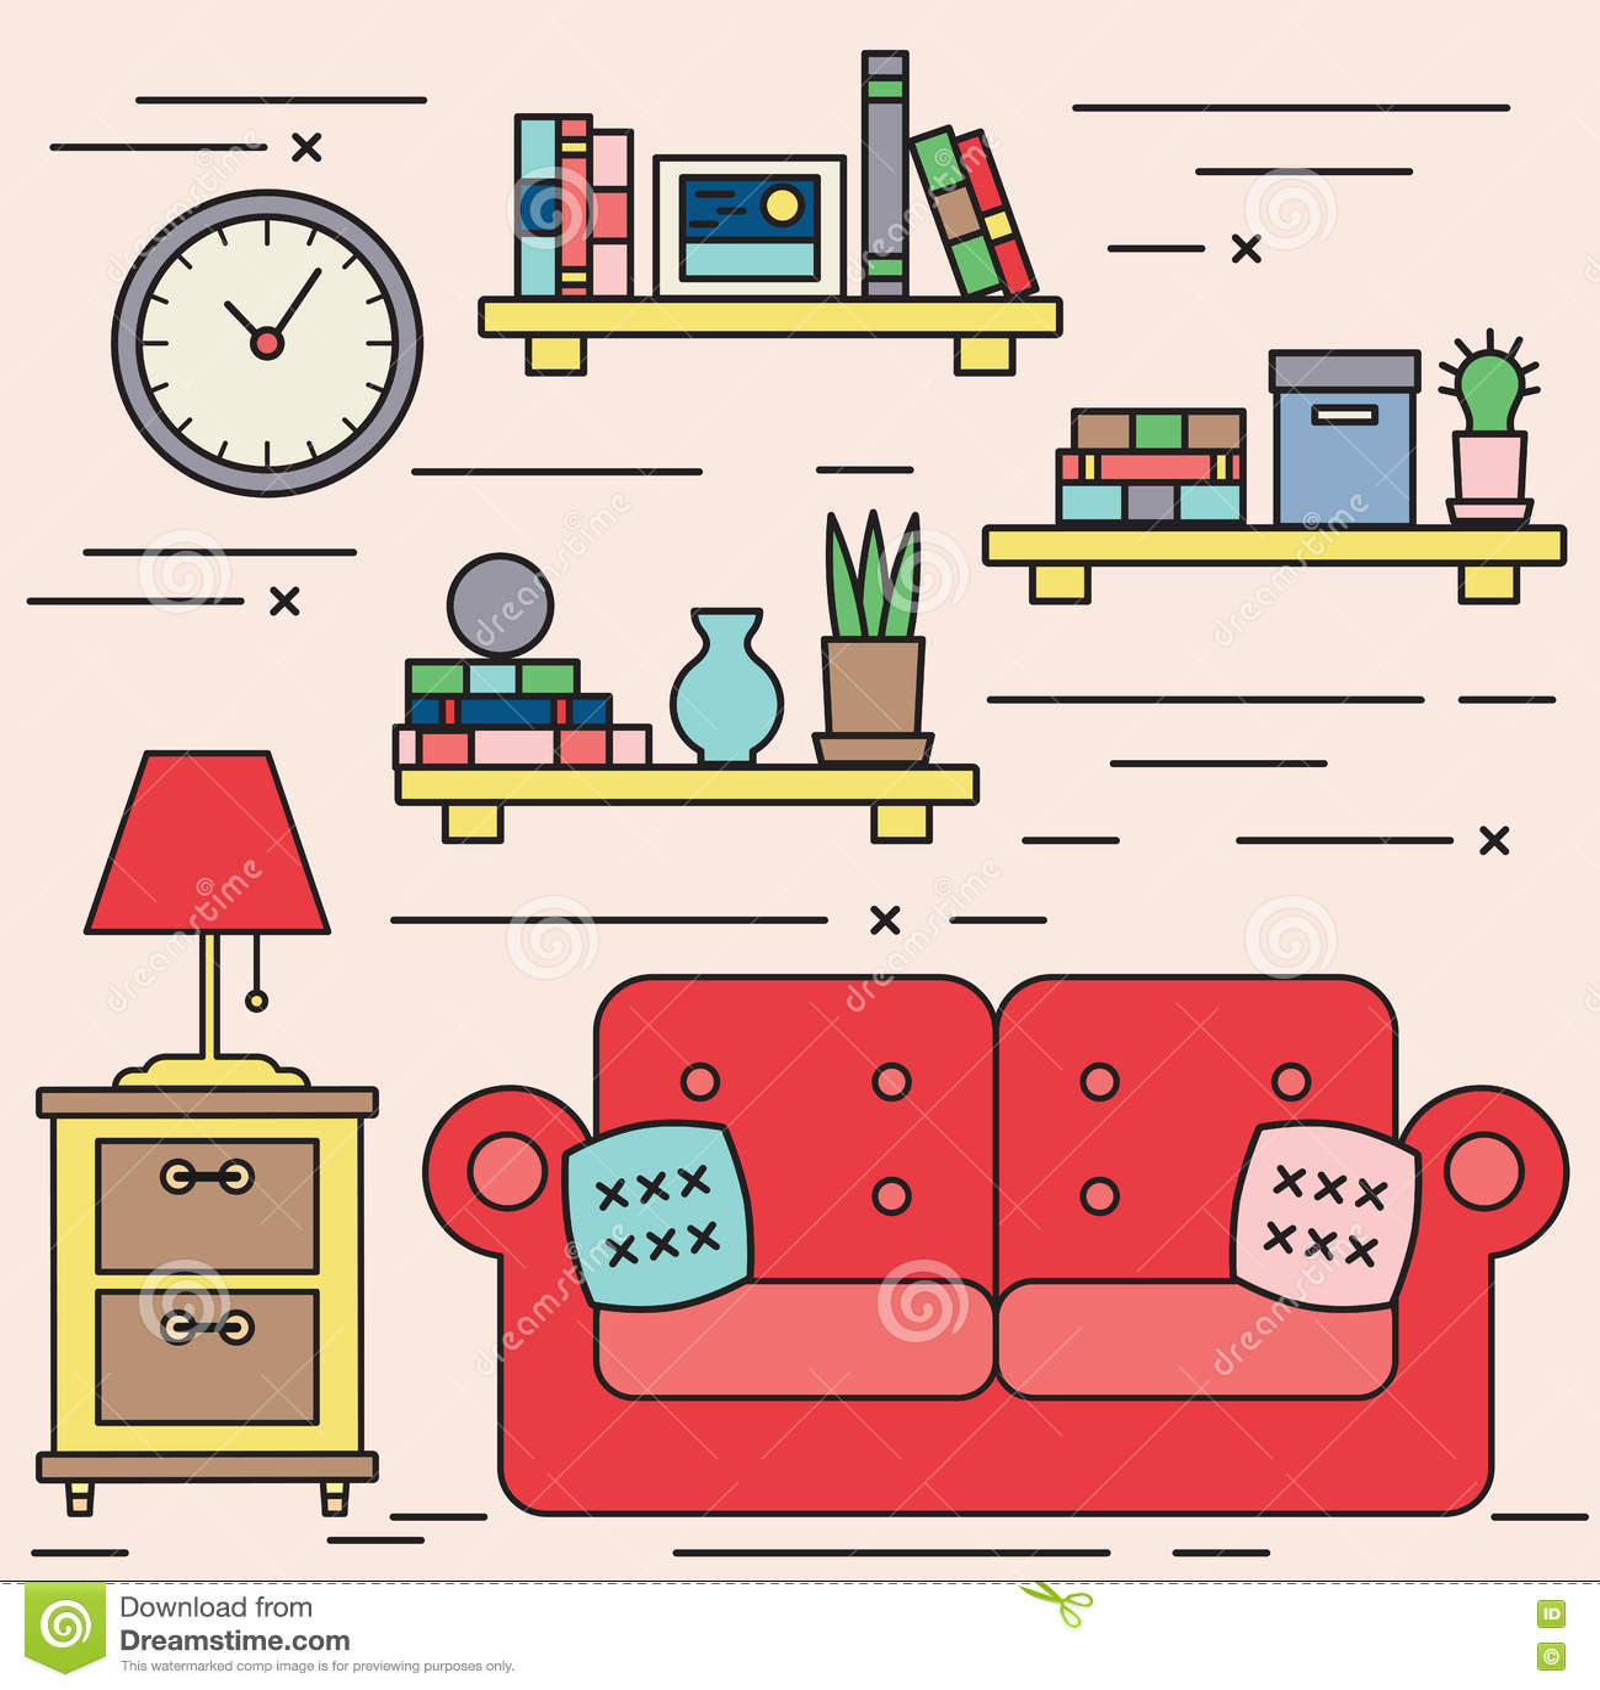 Living Room Line Art Illustration